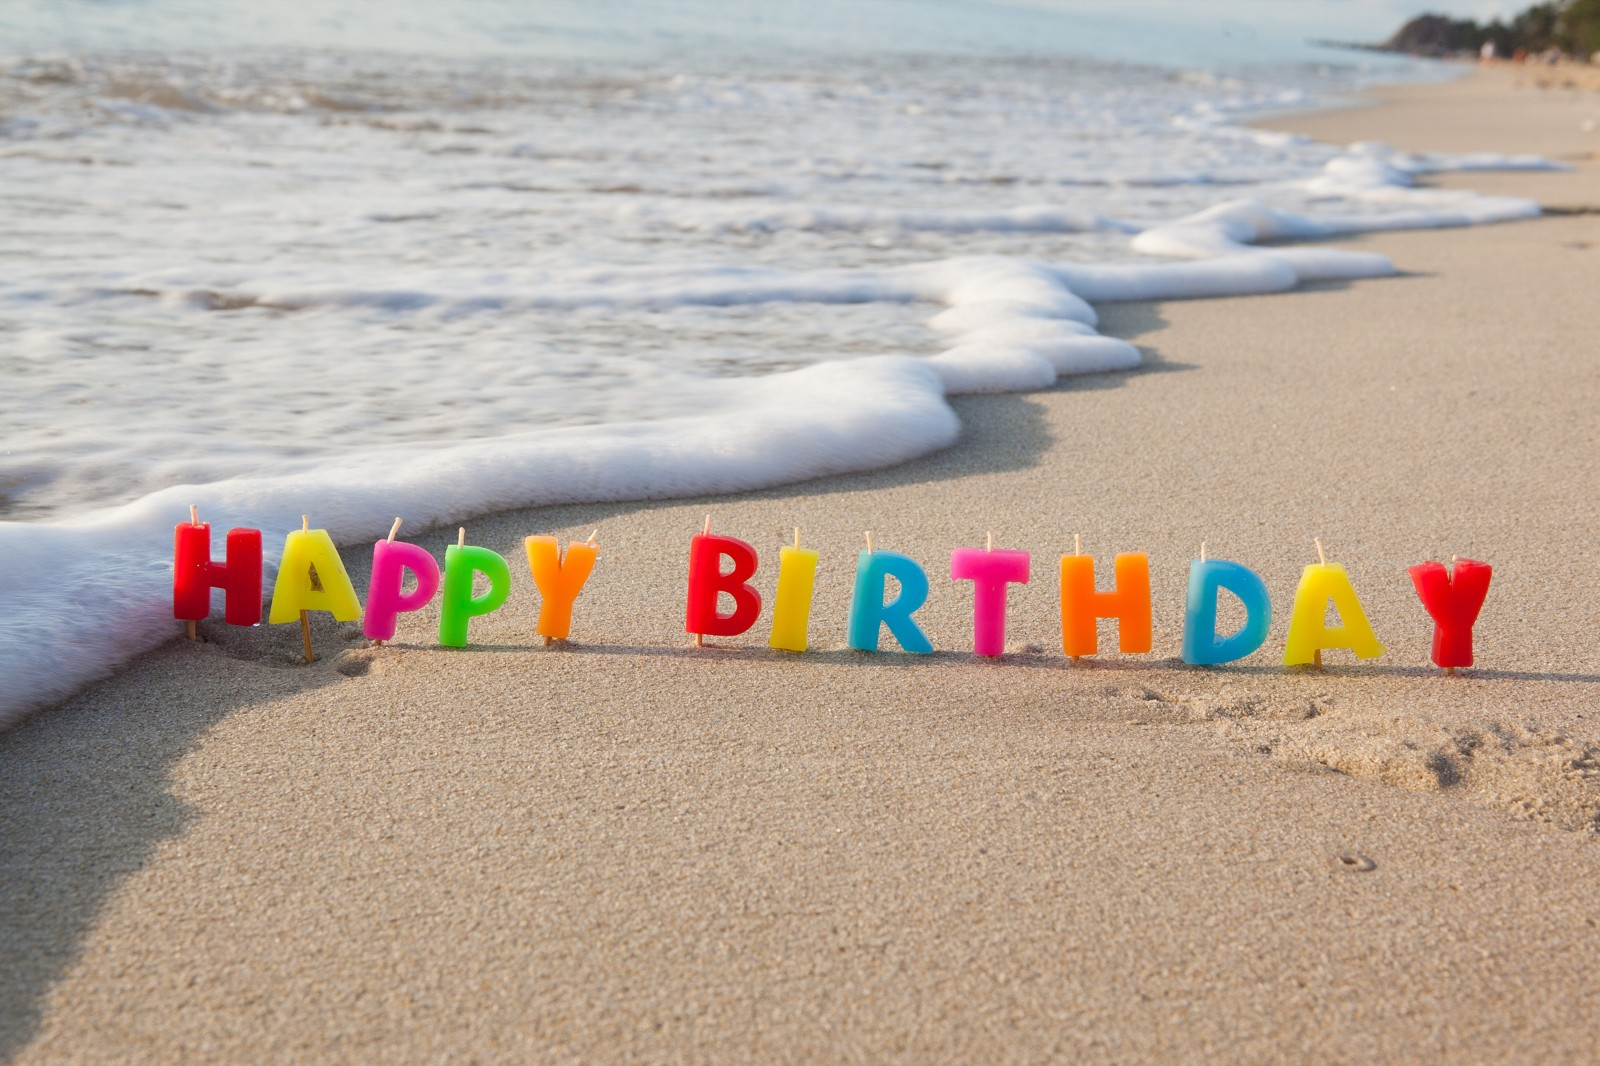 Birthday Card Sayings Beach : Happy birthday beach viewing gallery